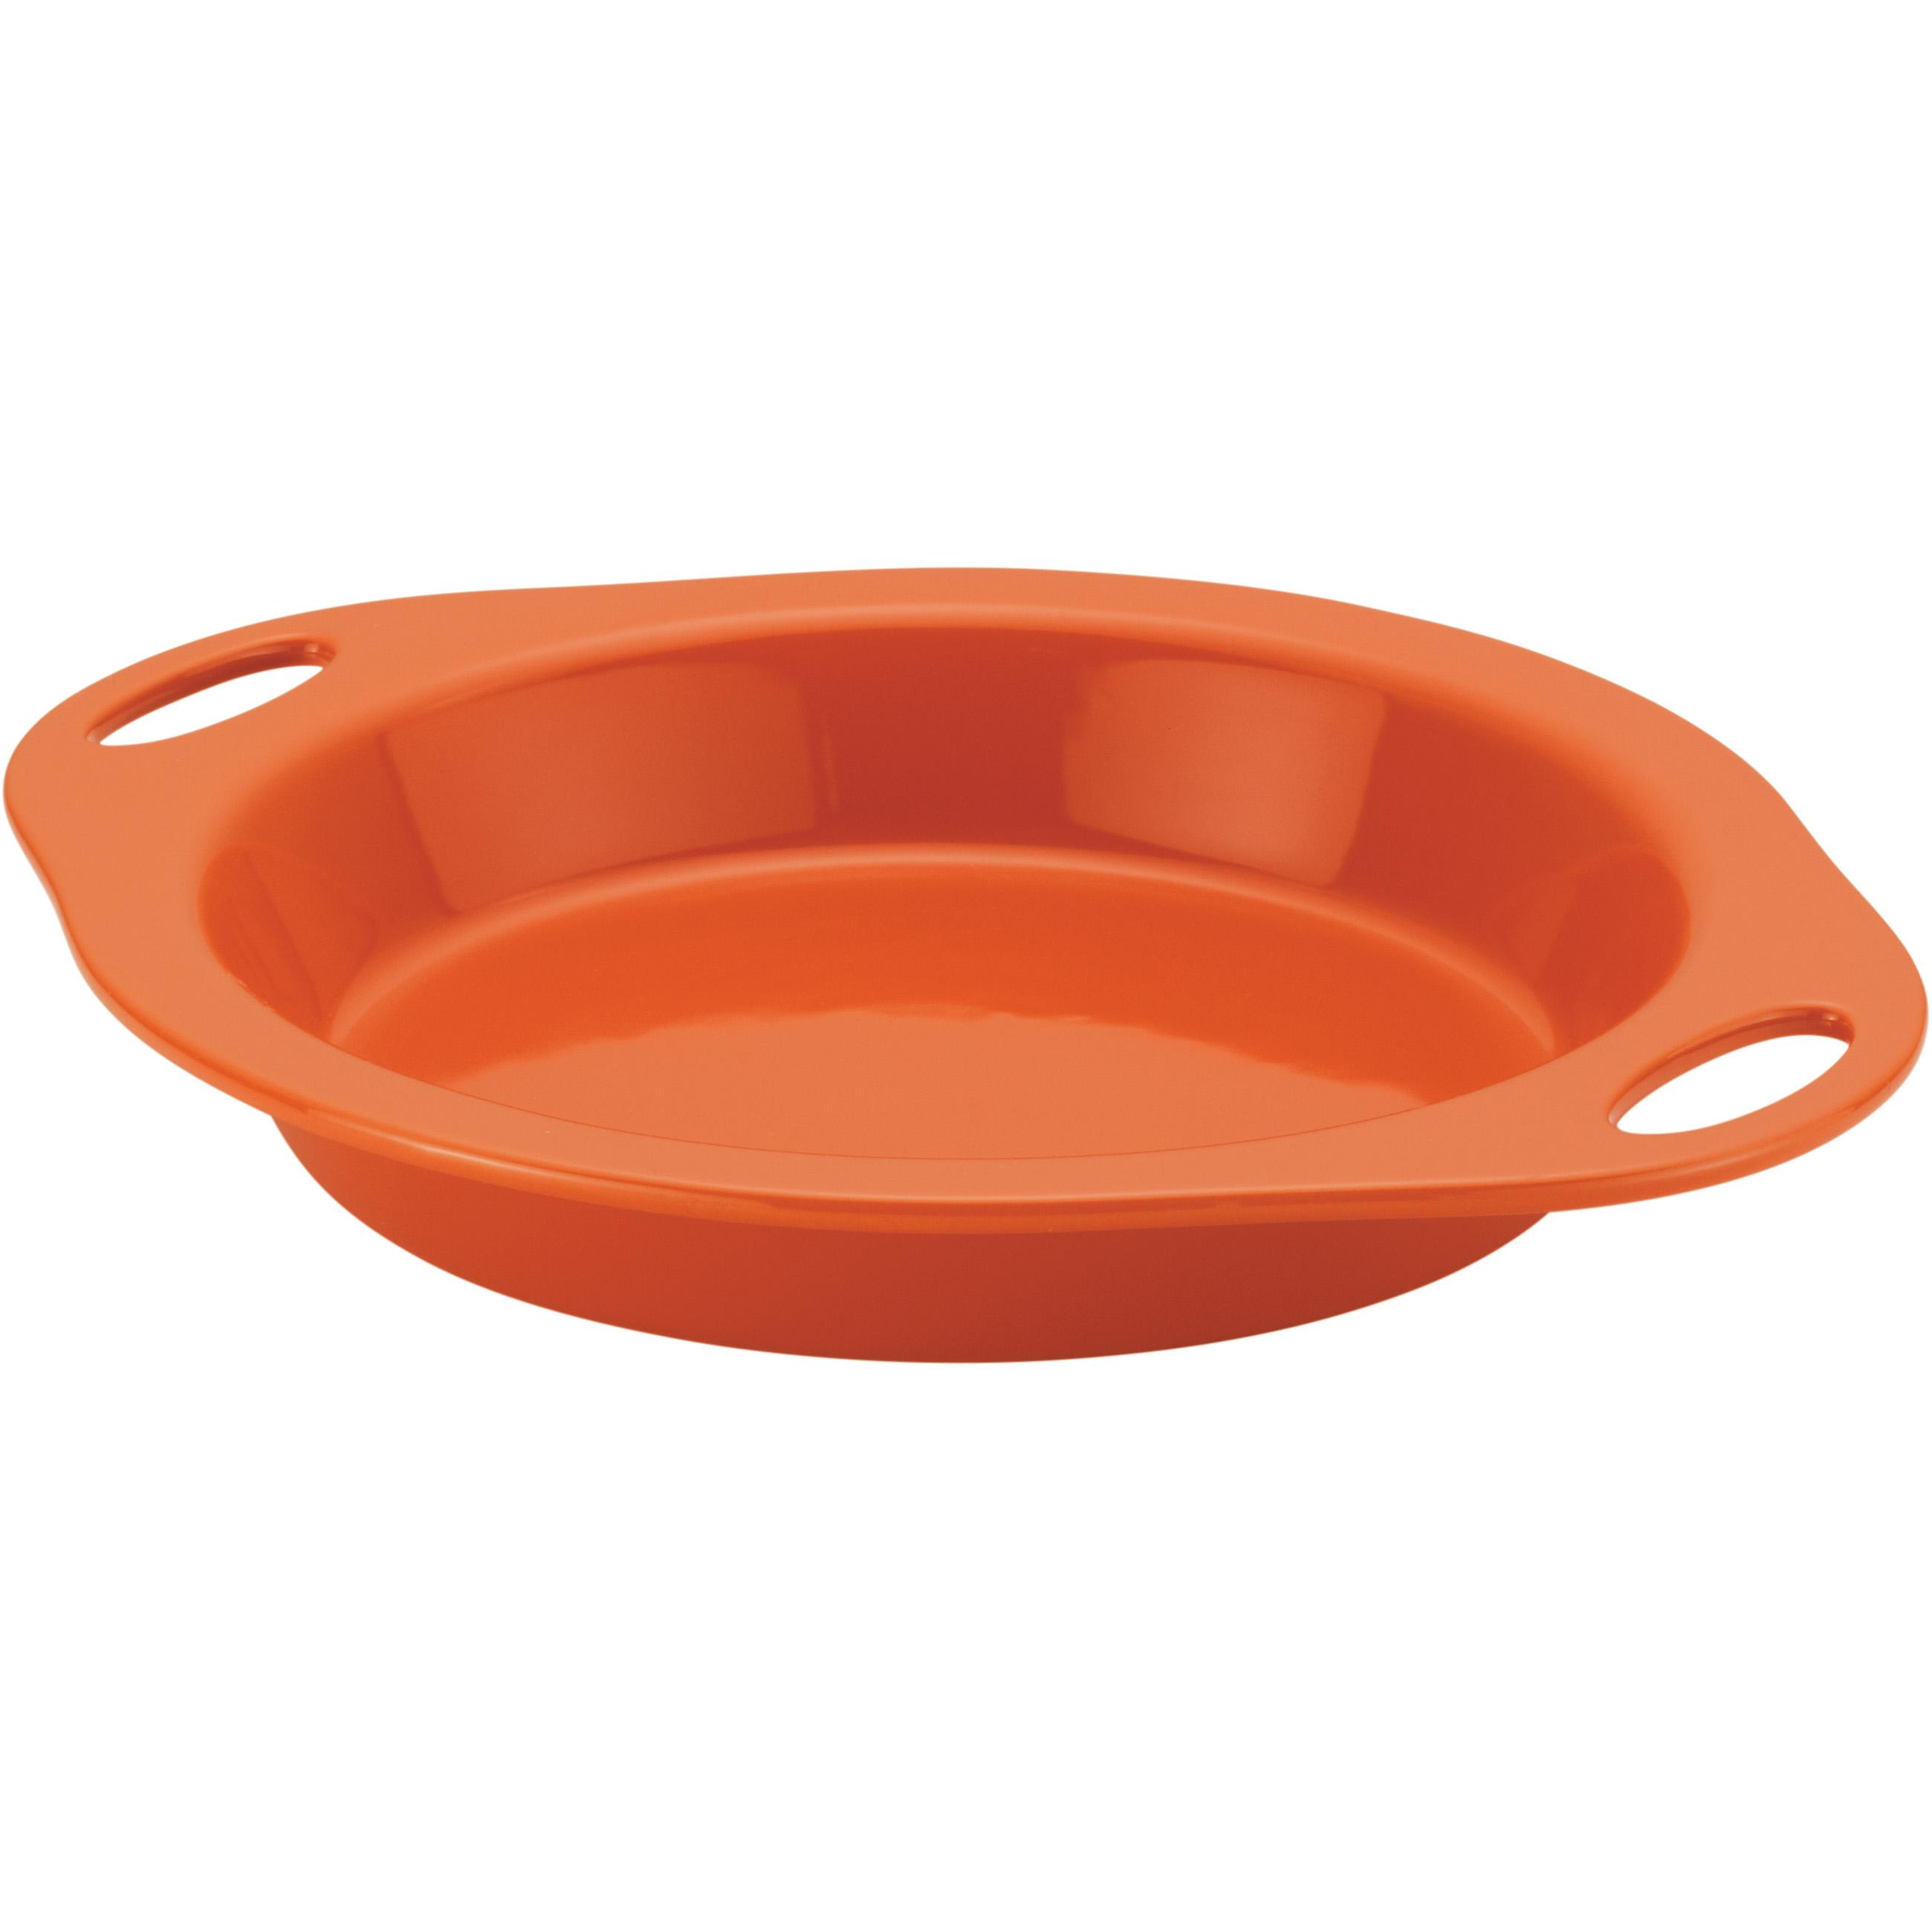 Rachael Ray Orange Stoneware Pie Baker, 9 Inch